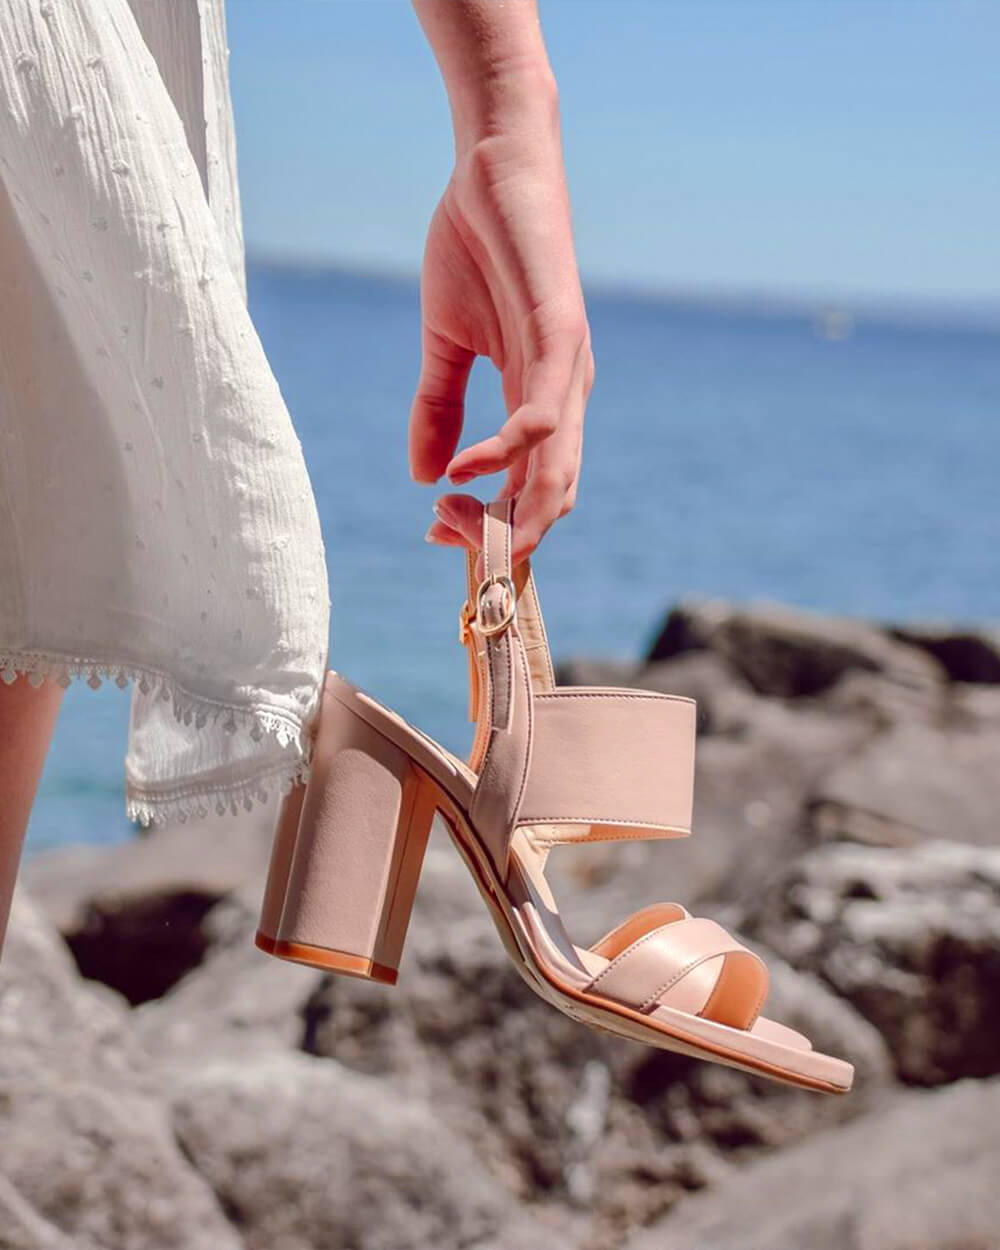 NBlanlac Vegan Luxury Shoes